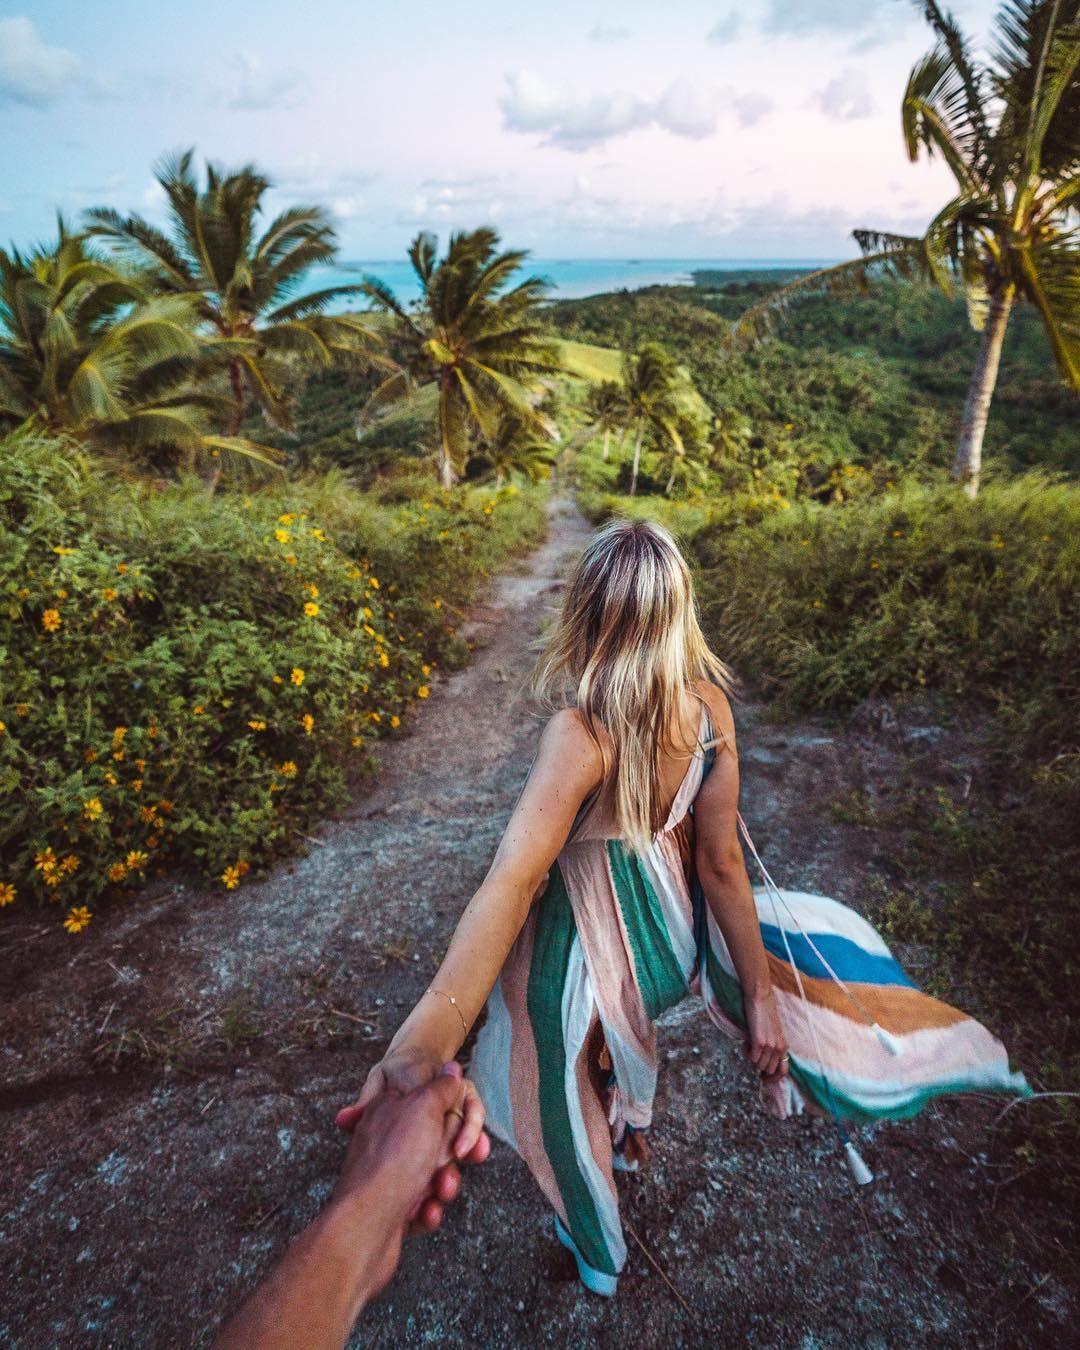 Cook Islands Beaches: Cook Islands Via @finduslost